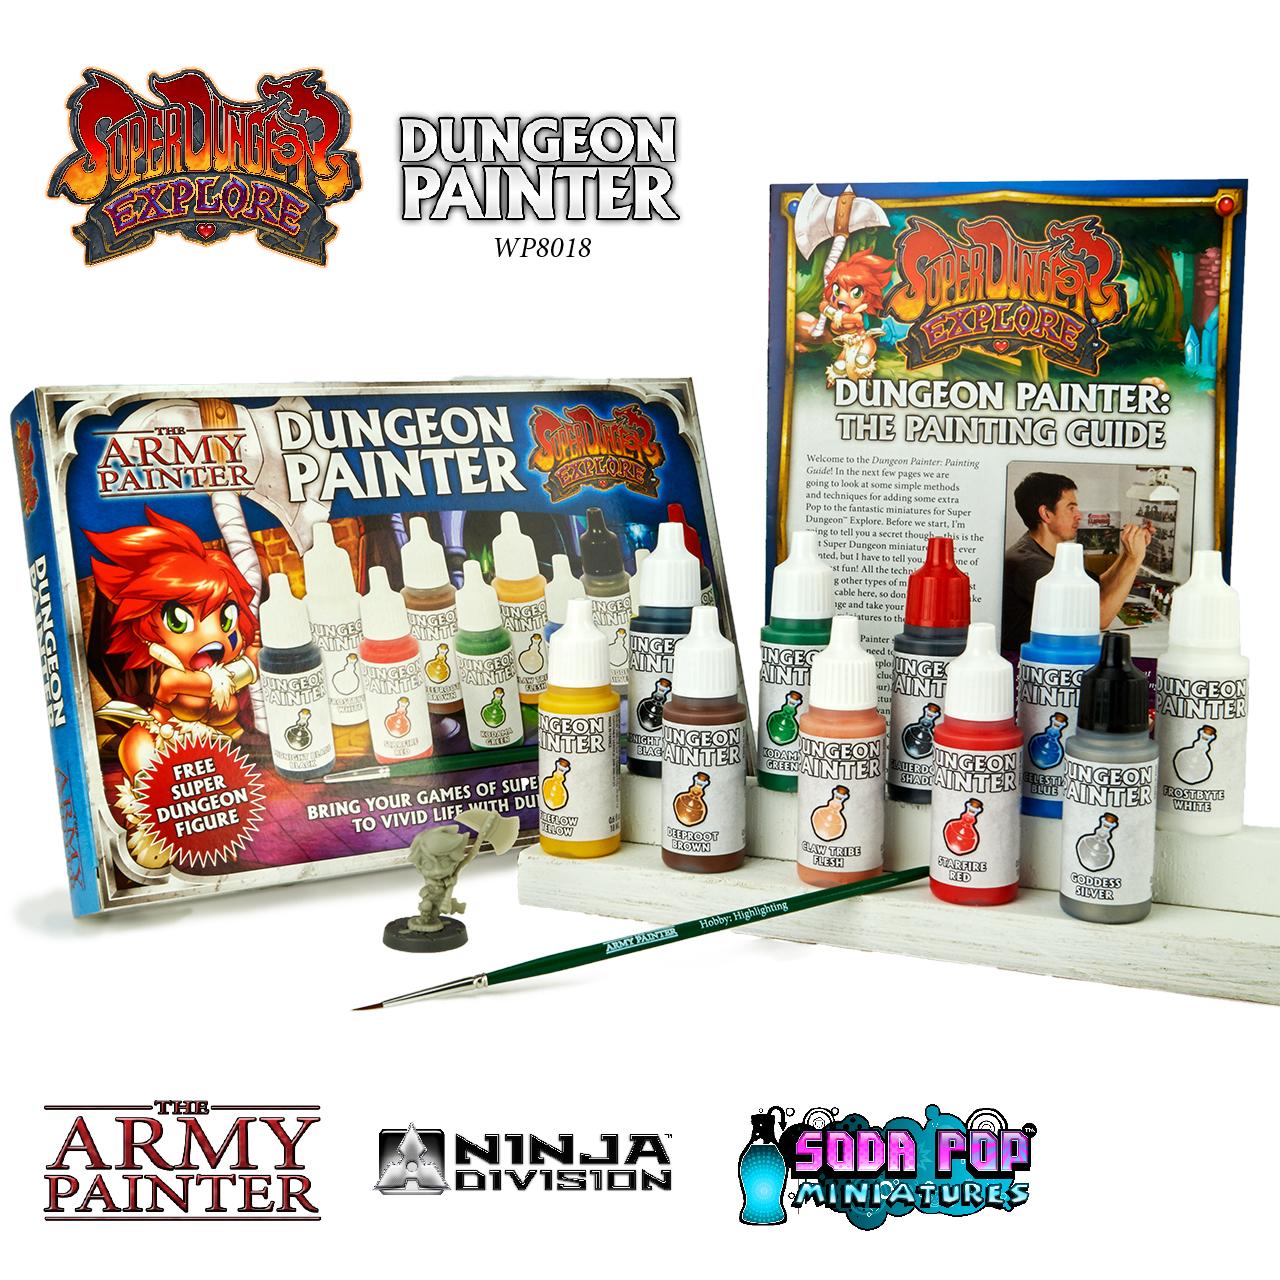 Super Dungeon Explore: Dungeon Painter image